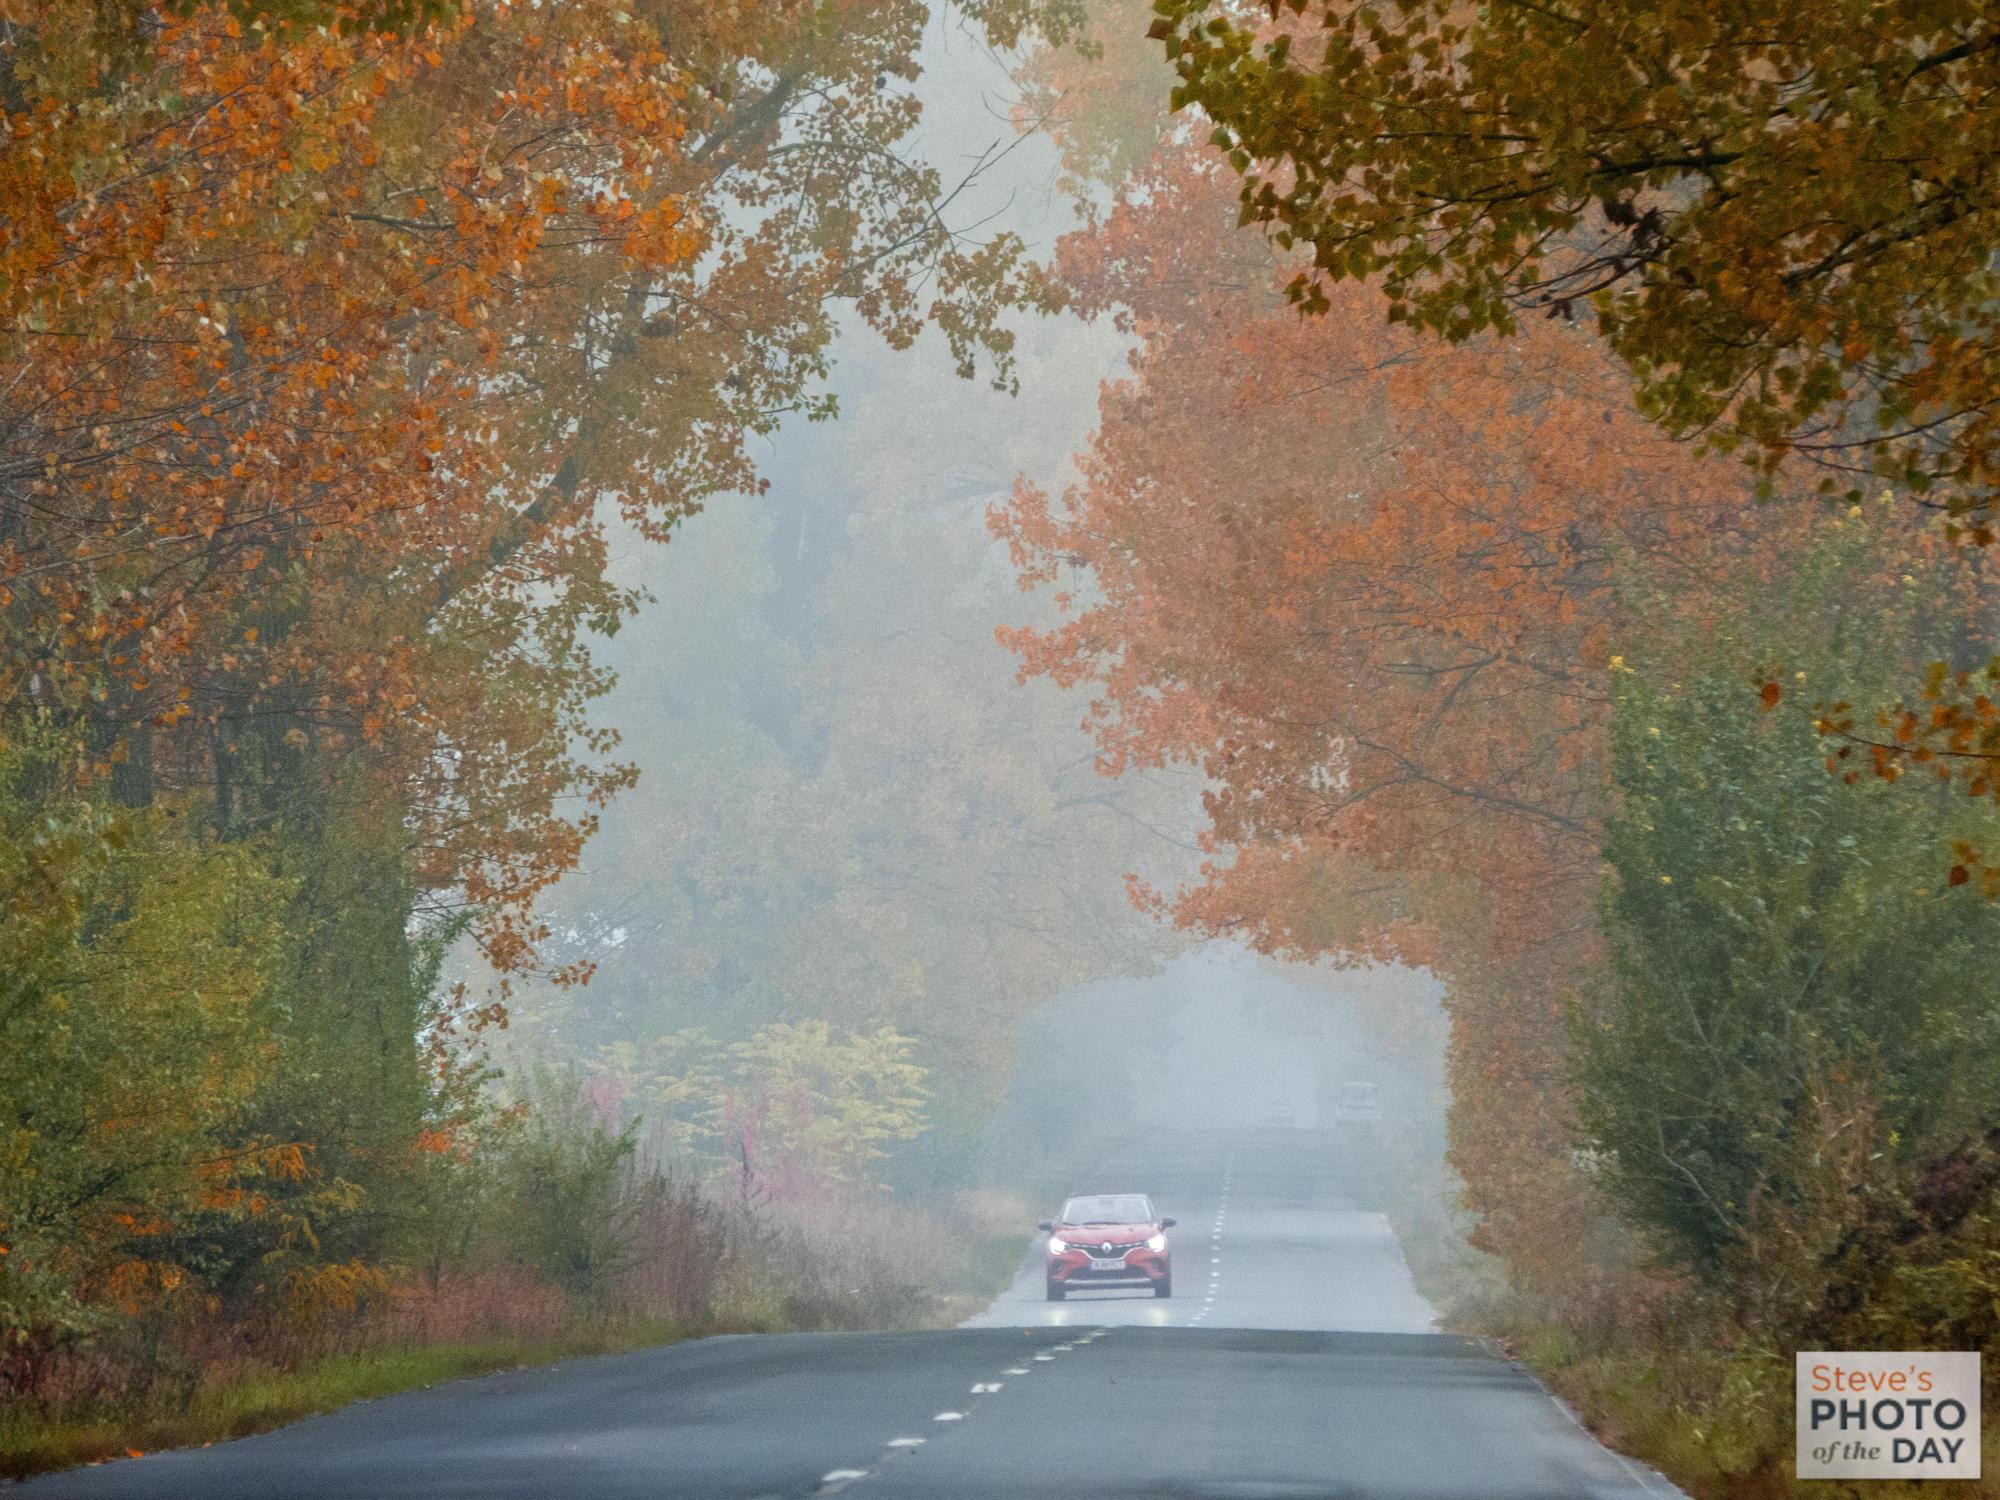 Autumn on the road